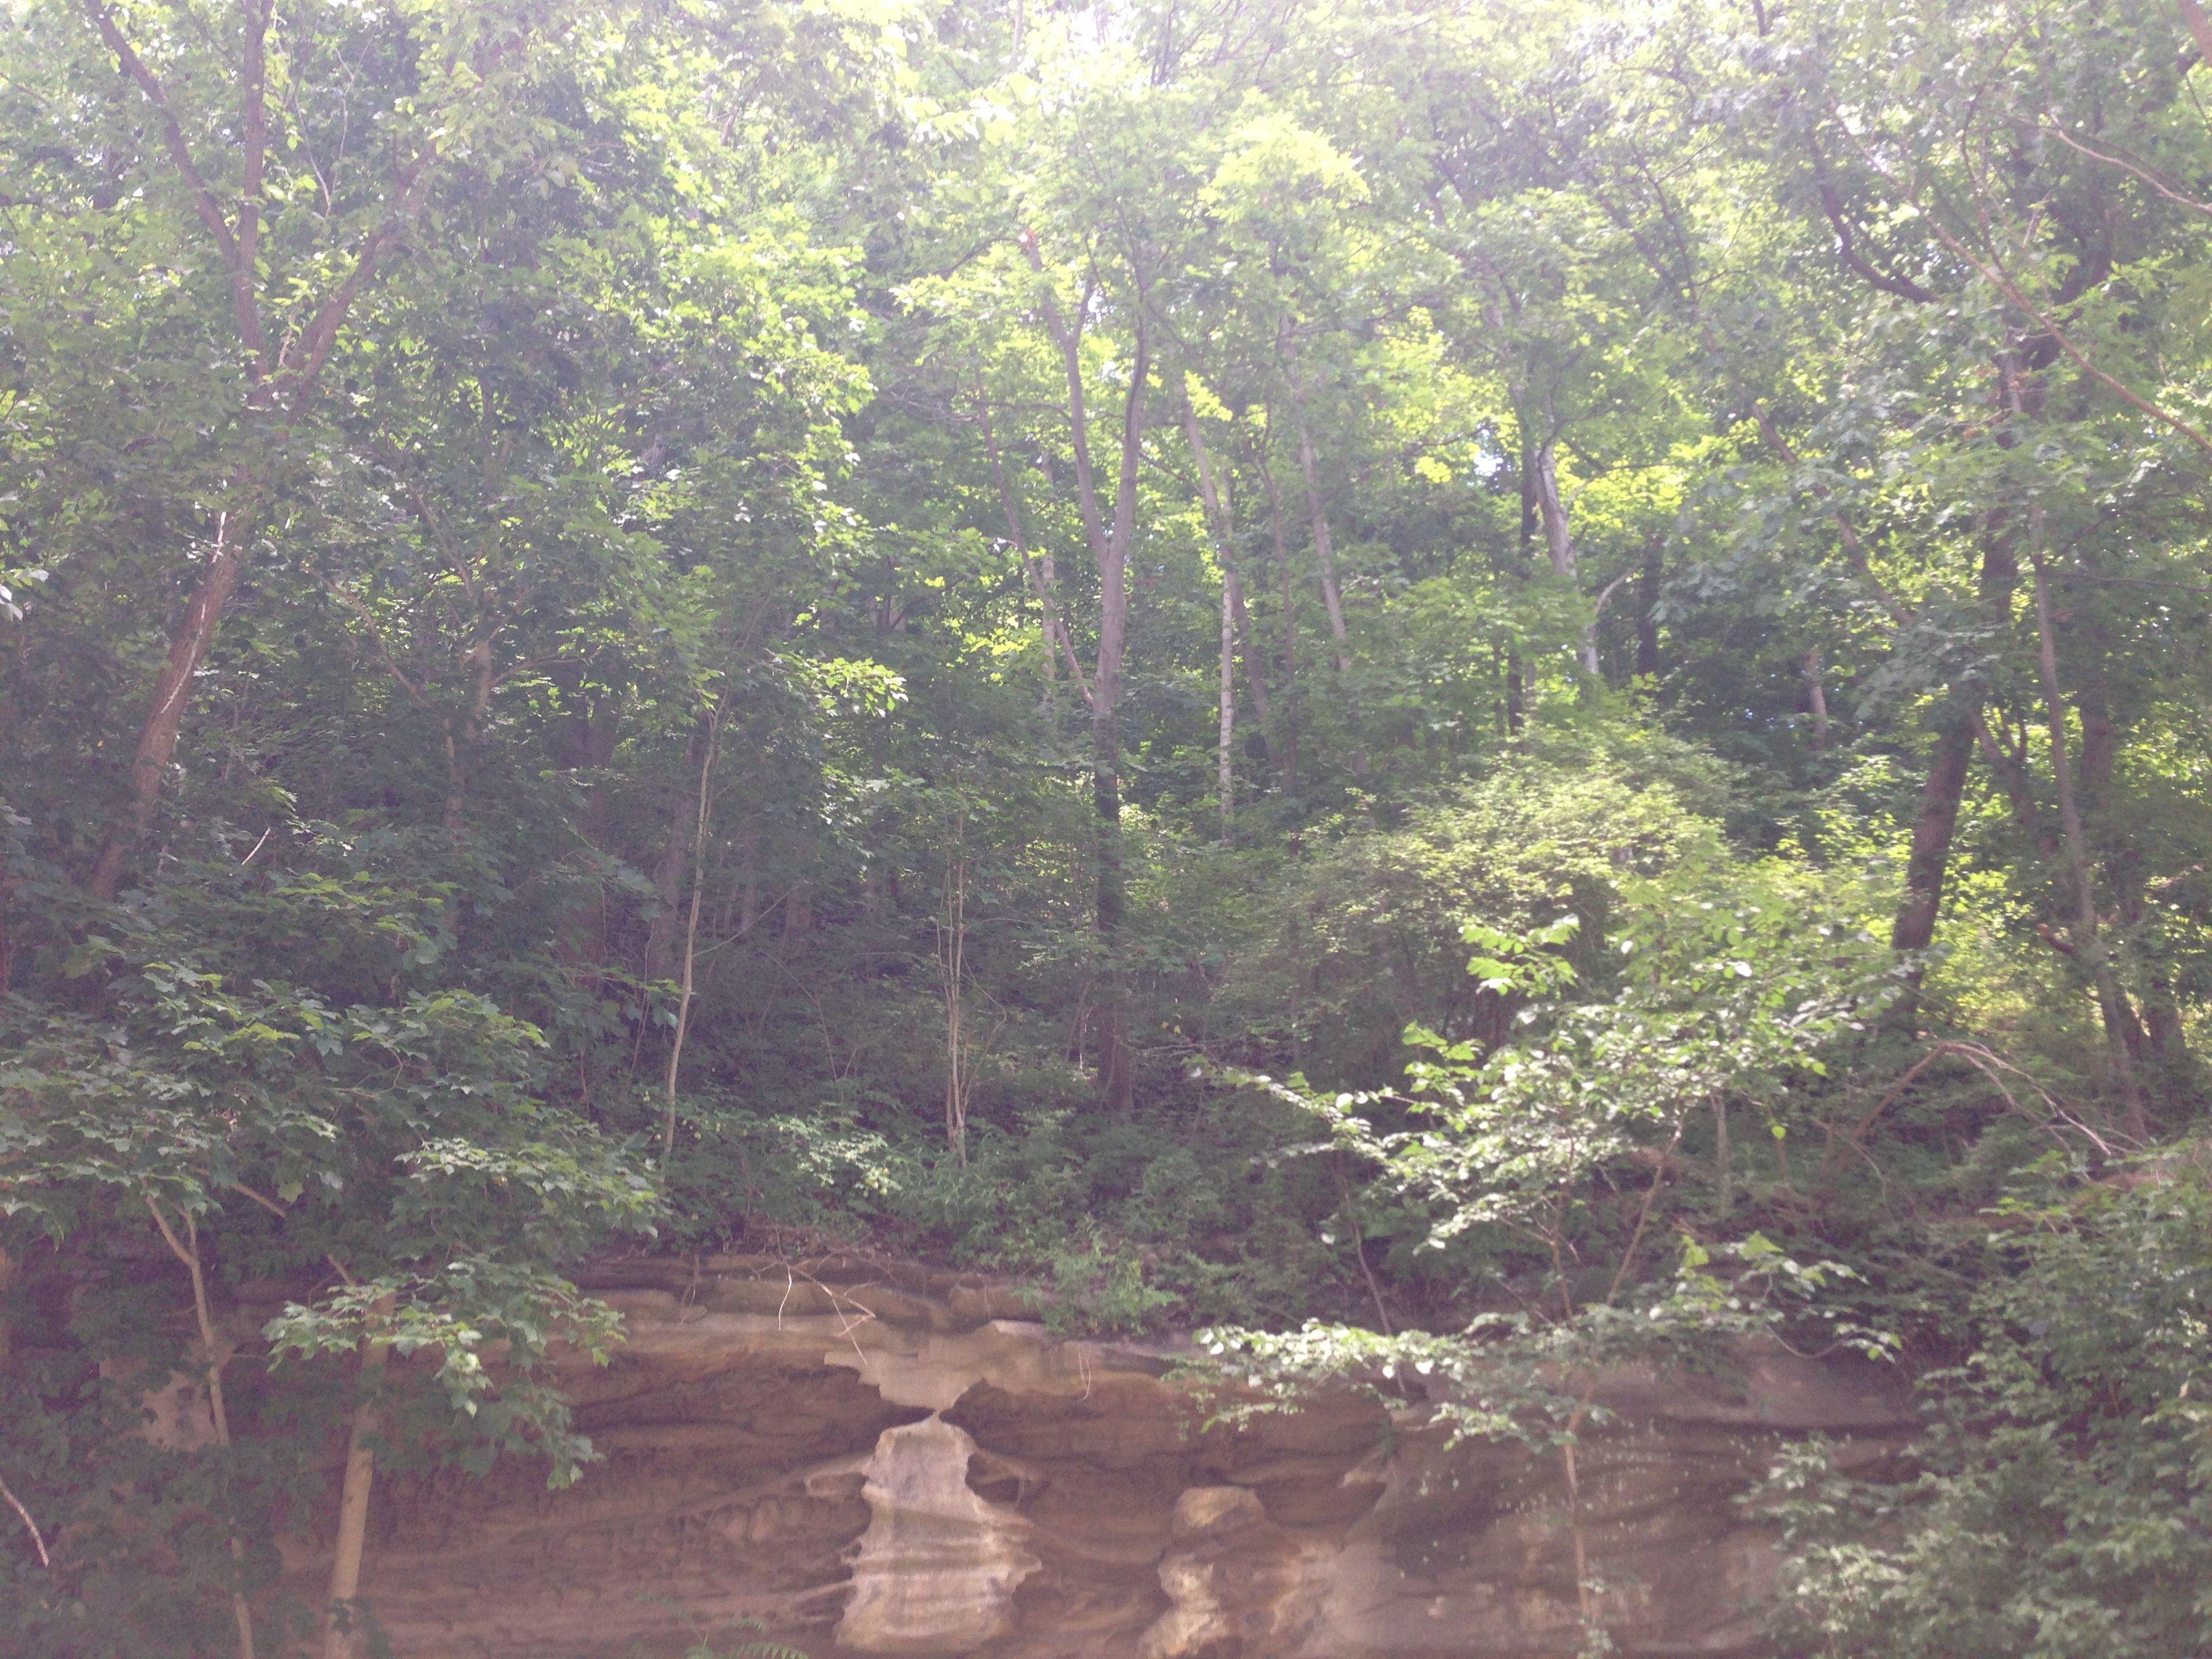 An interesting cliff side in Cedar Creek Park, Pennsylvania.